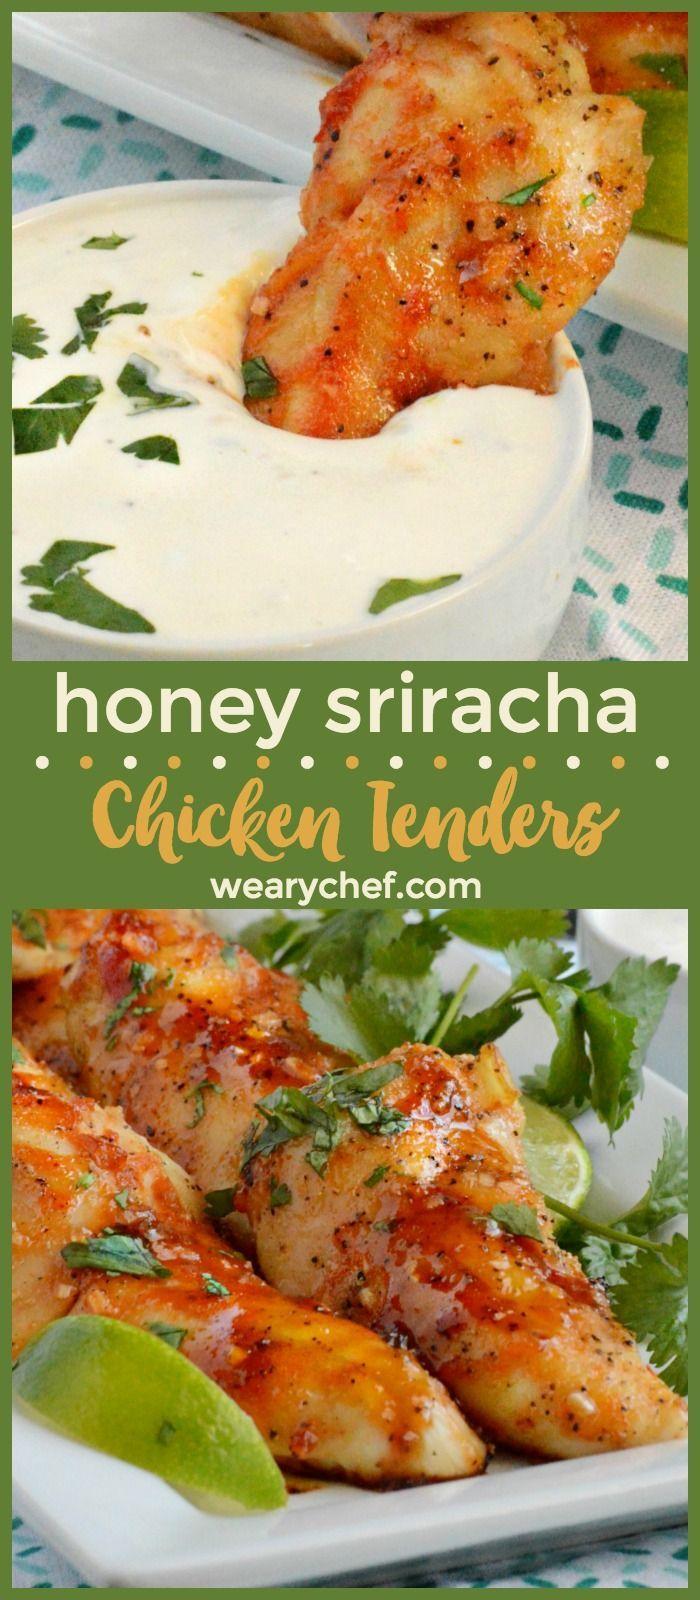 Easy chicken recipes tenders